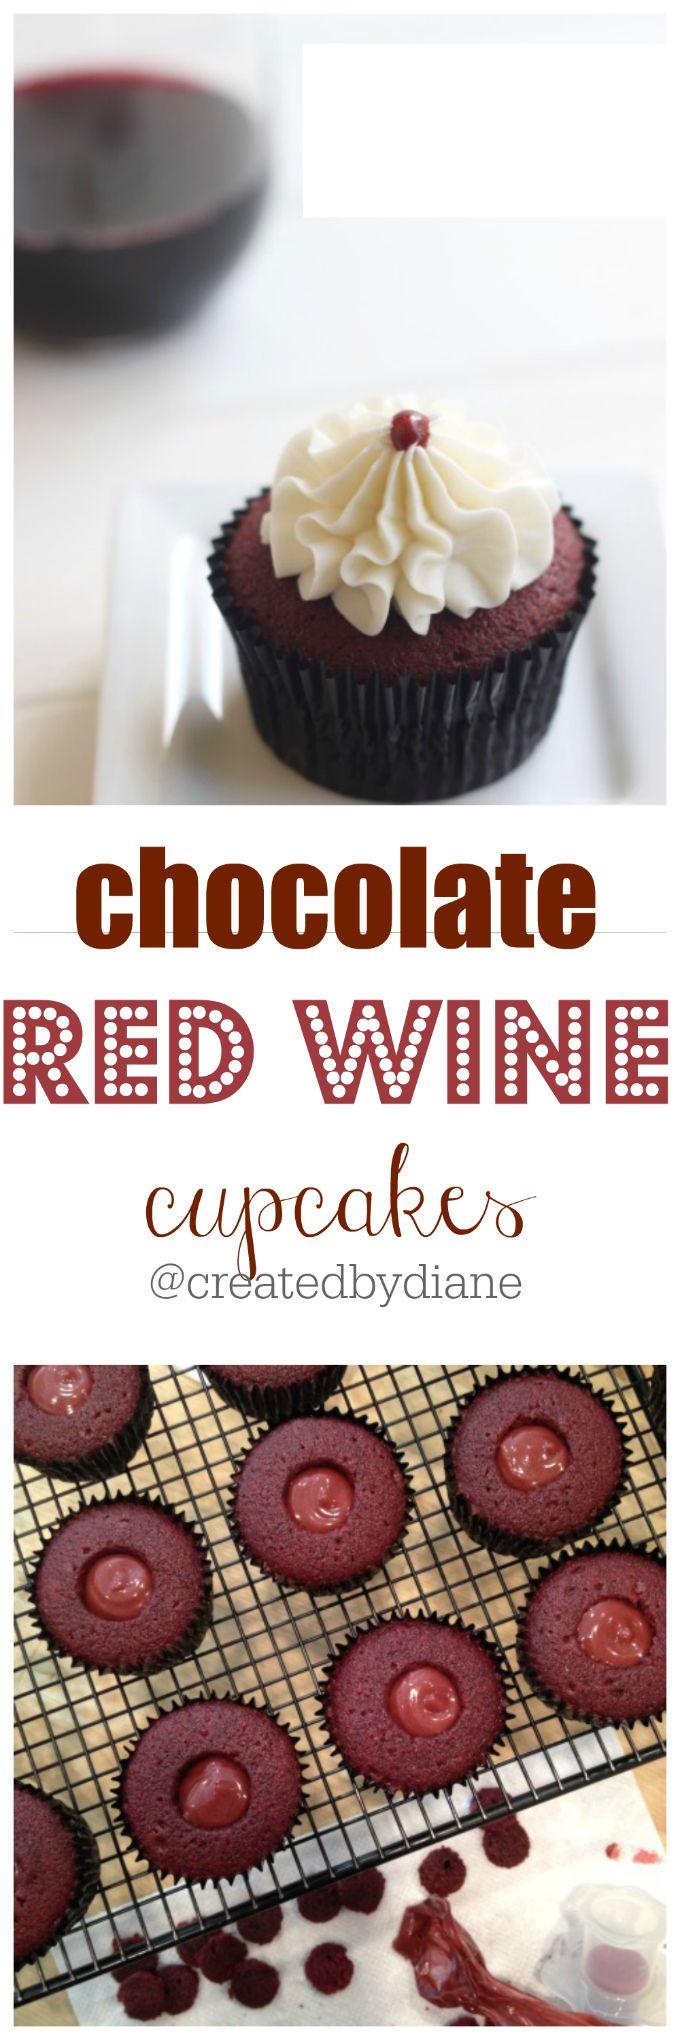 chocolate red wine cupcakes @createdbydiane